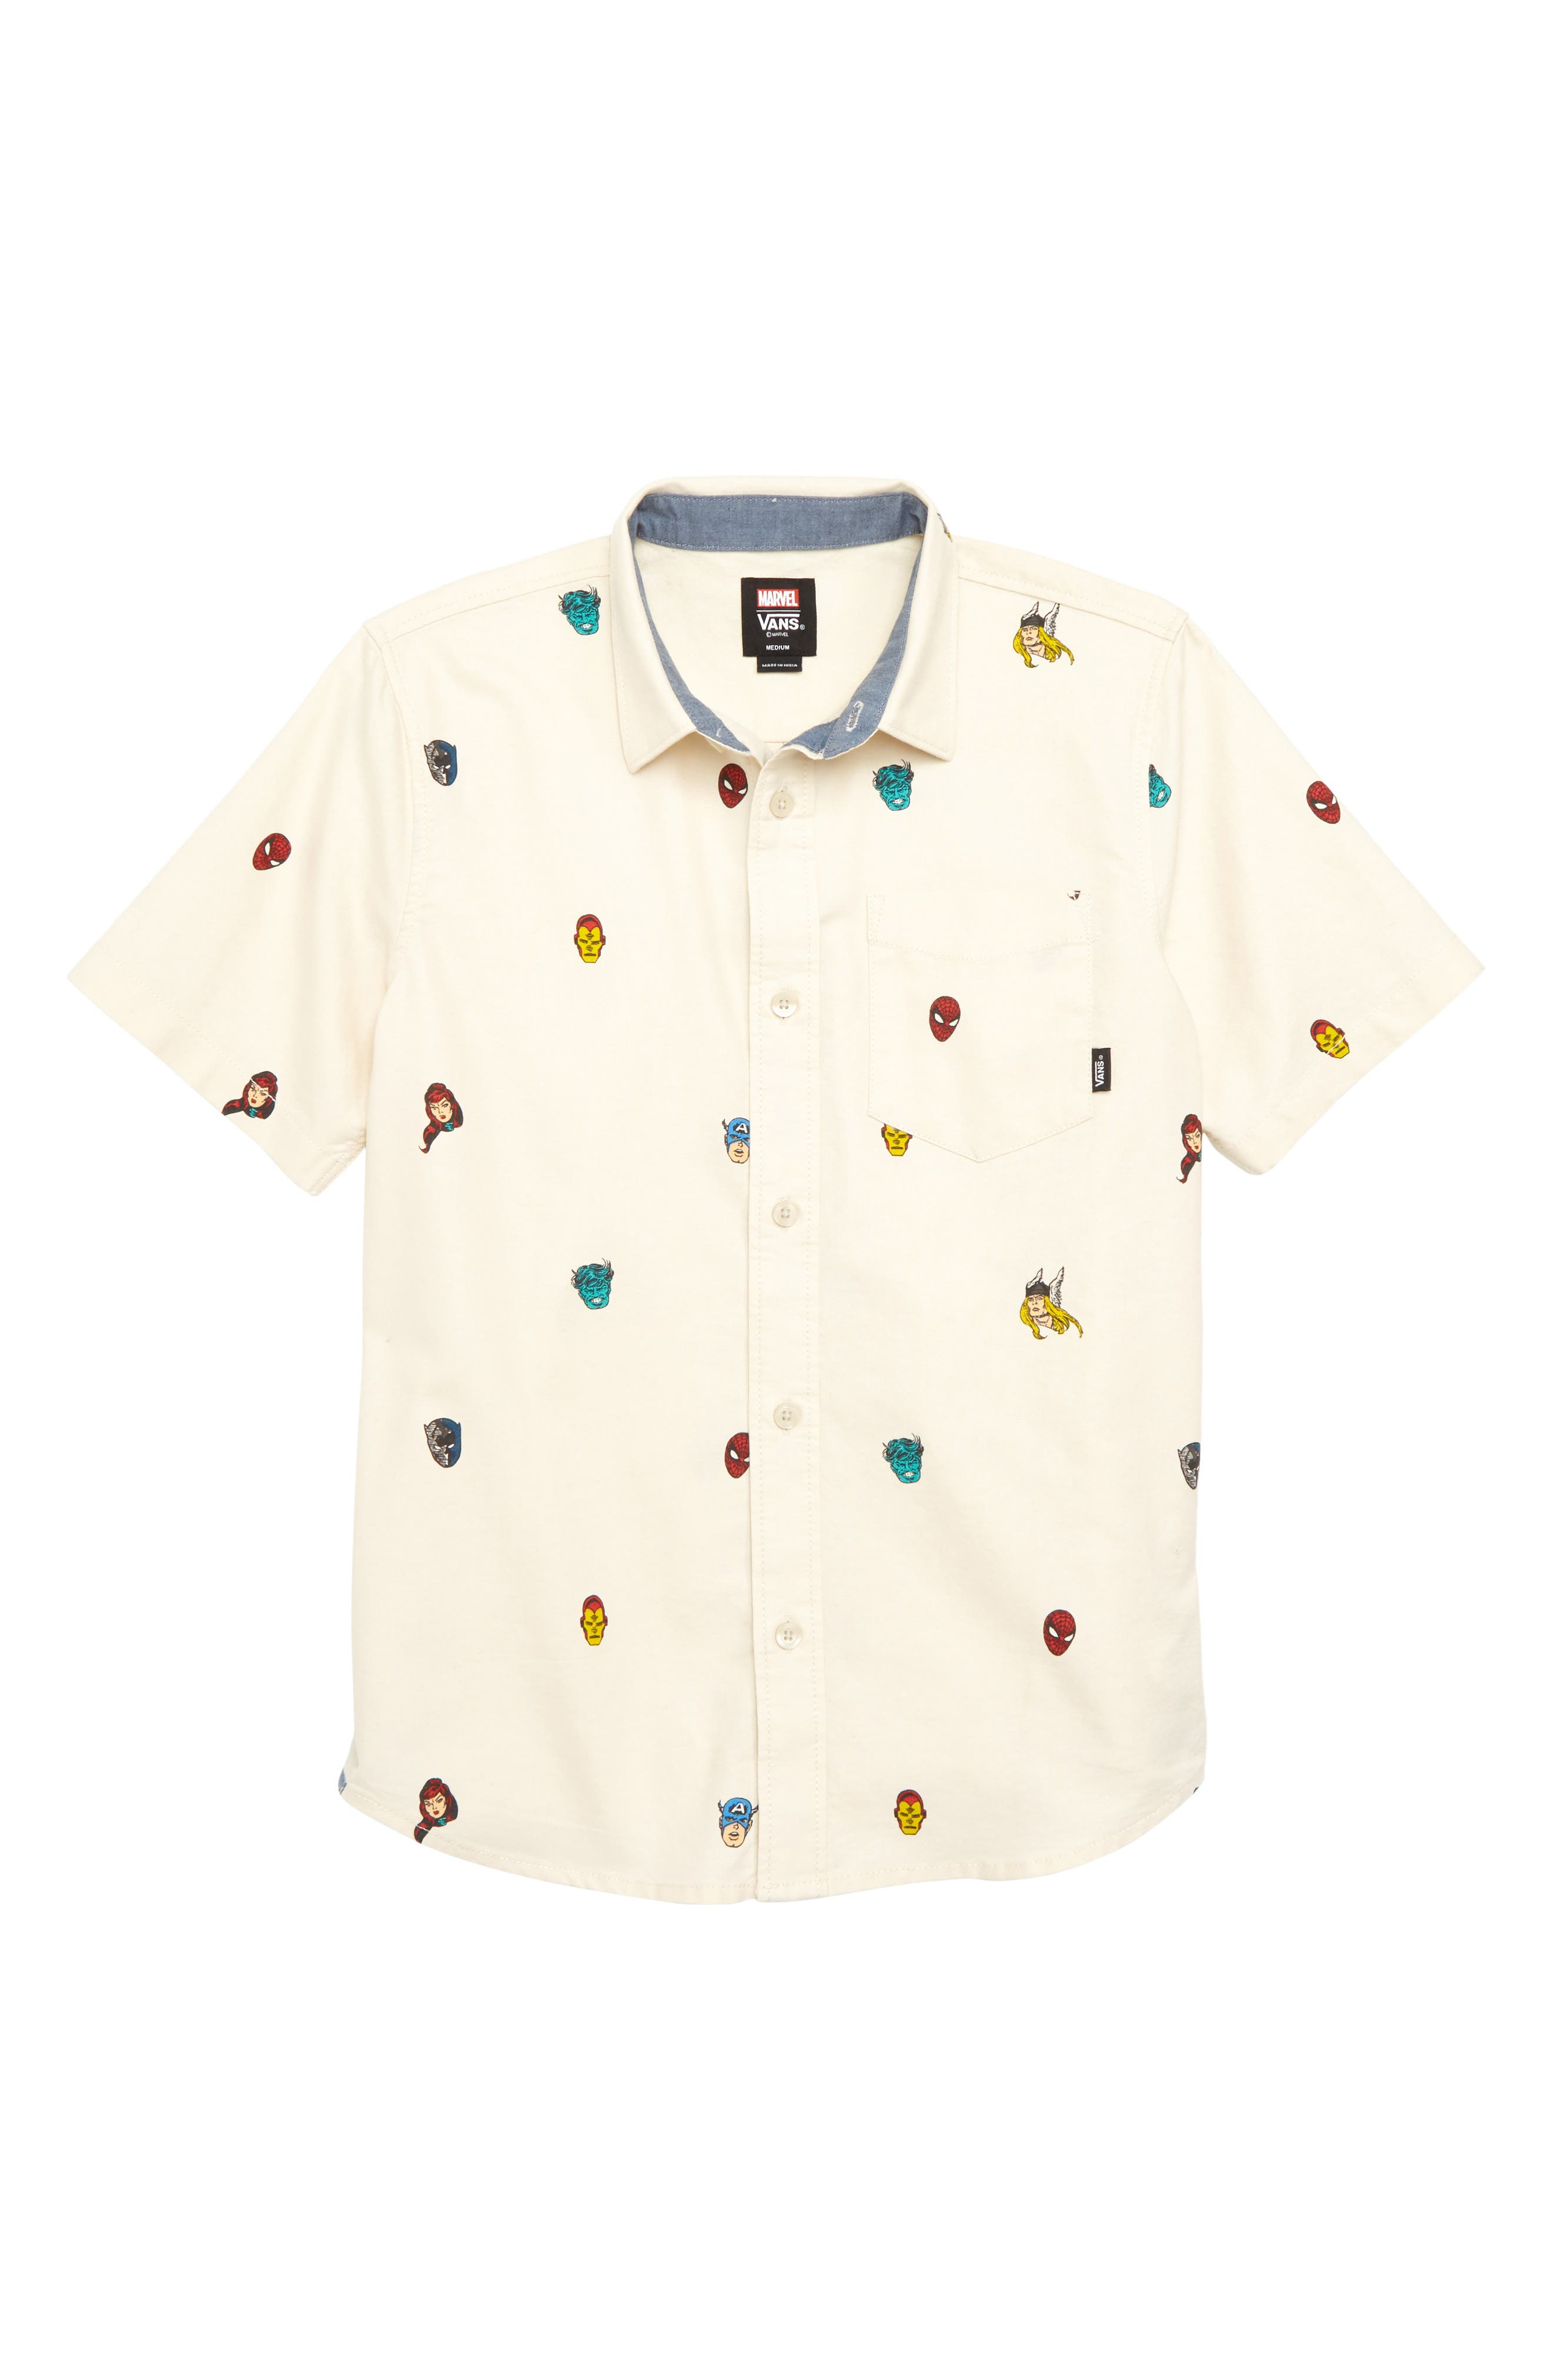 x Marvel<sup>®</sup> Avengers Woven Shirt,                         Main,                         color, 250